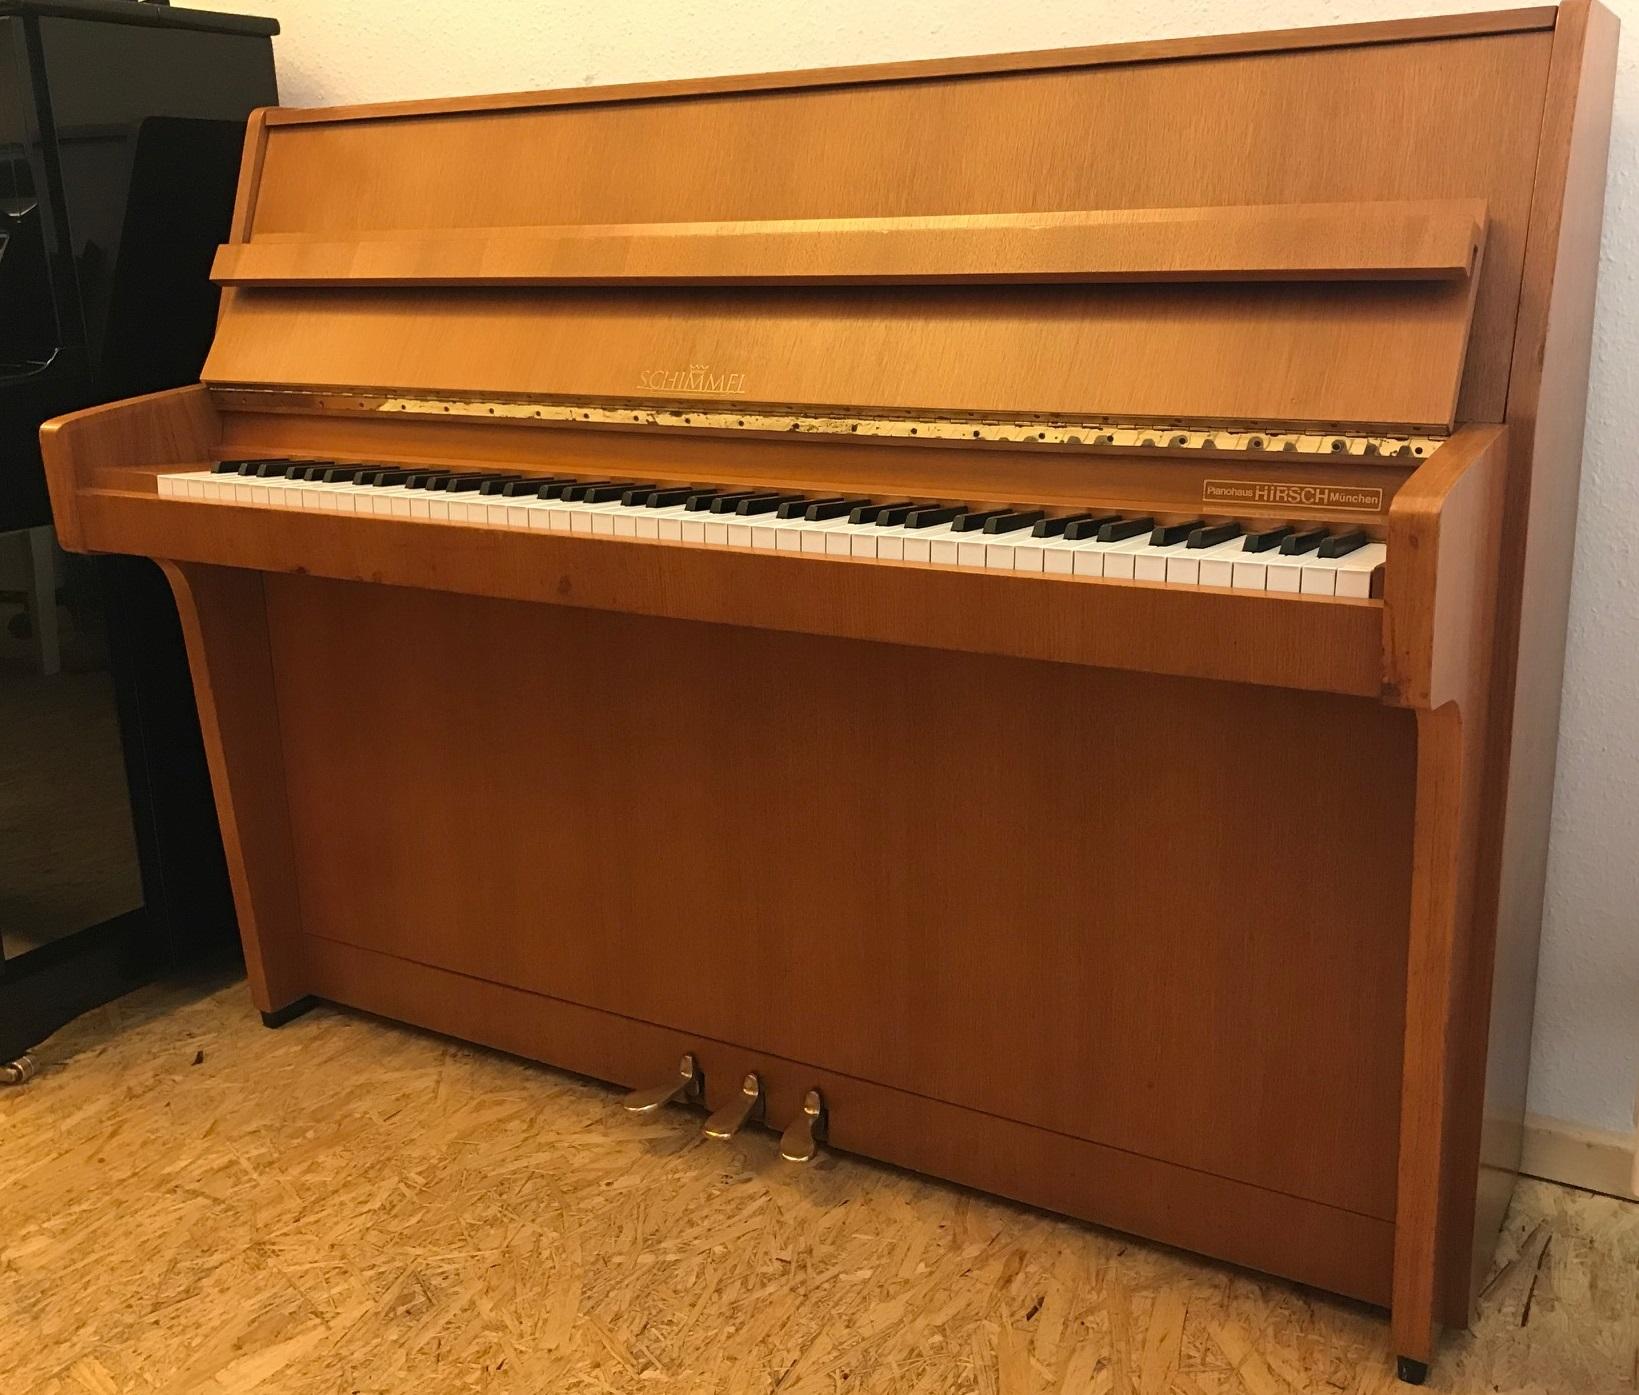 Schimmel-Klavier Modell 109 gebraucht